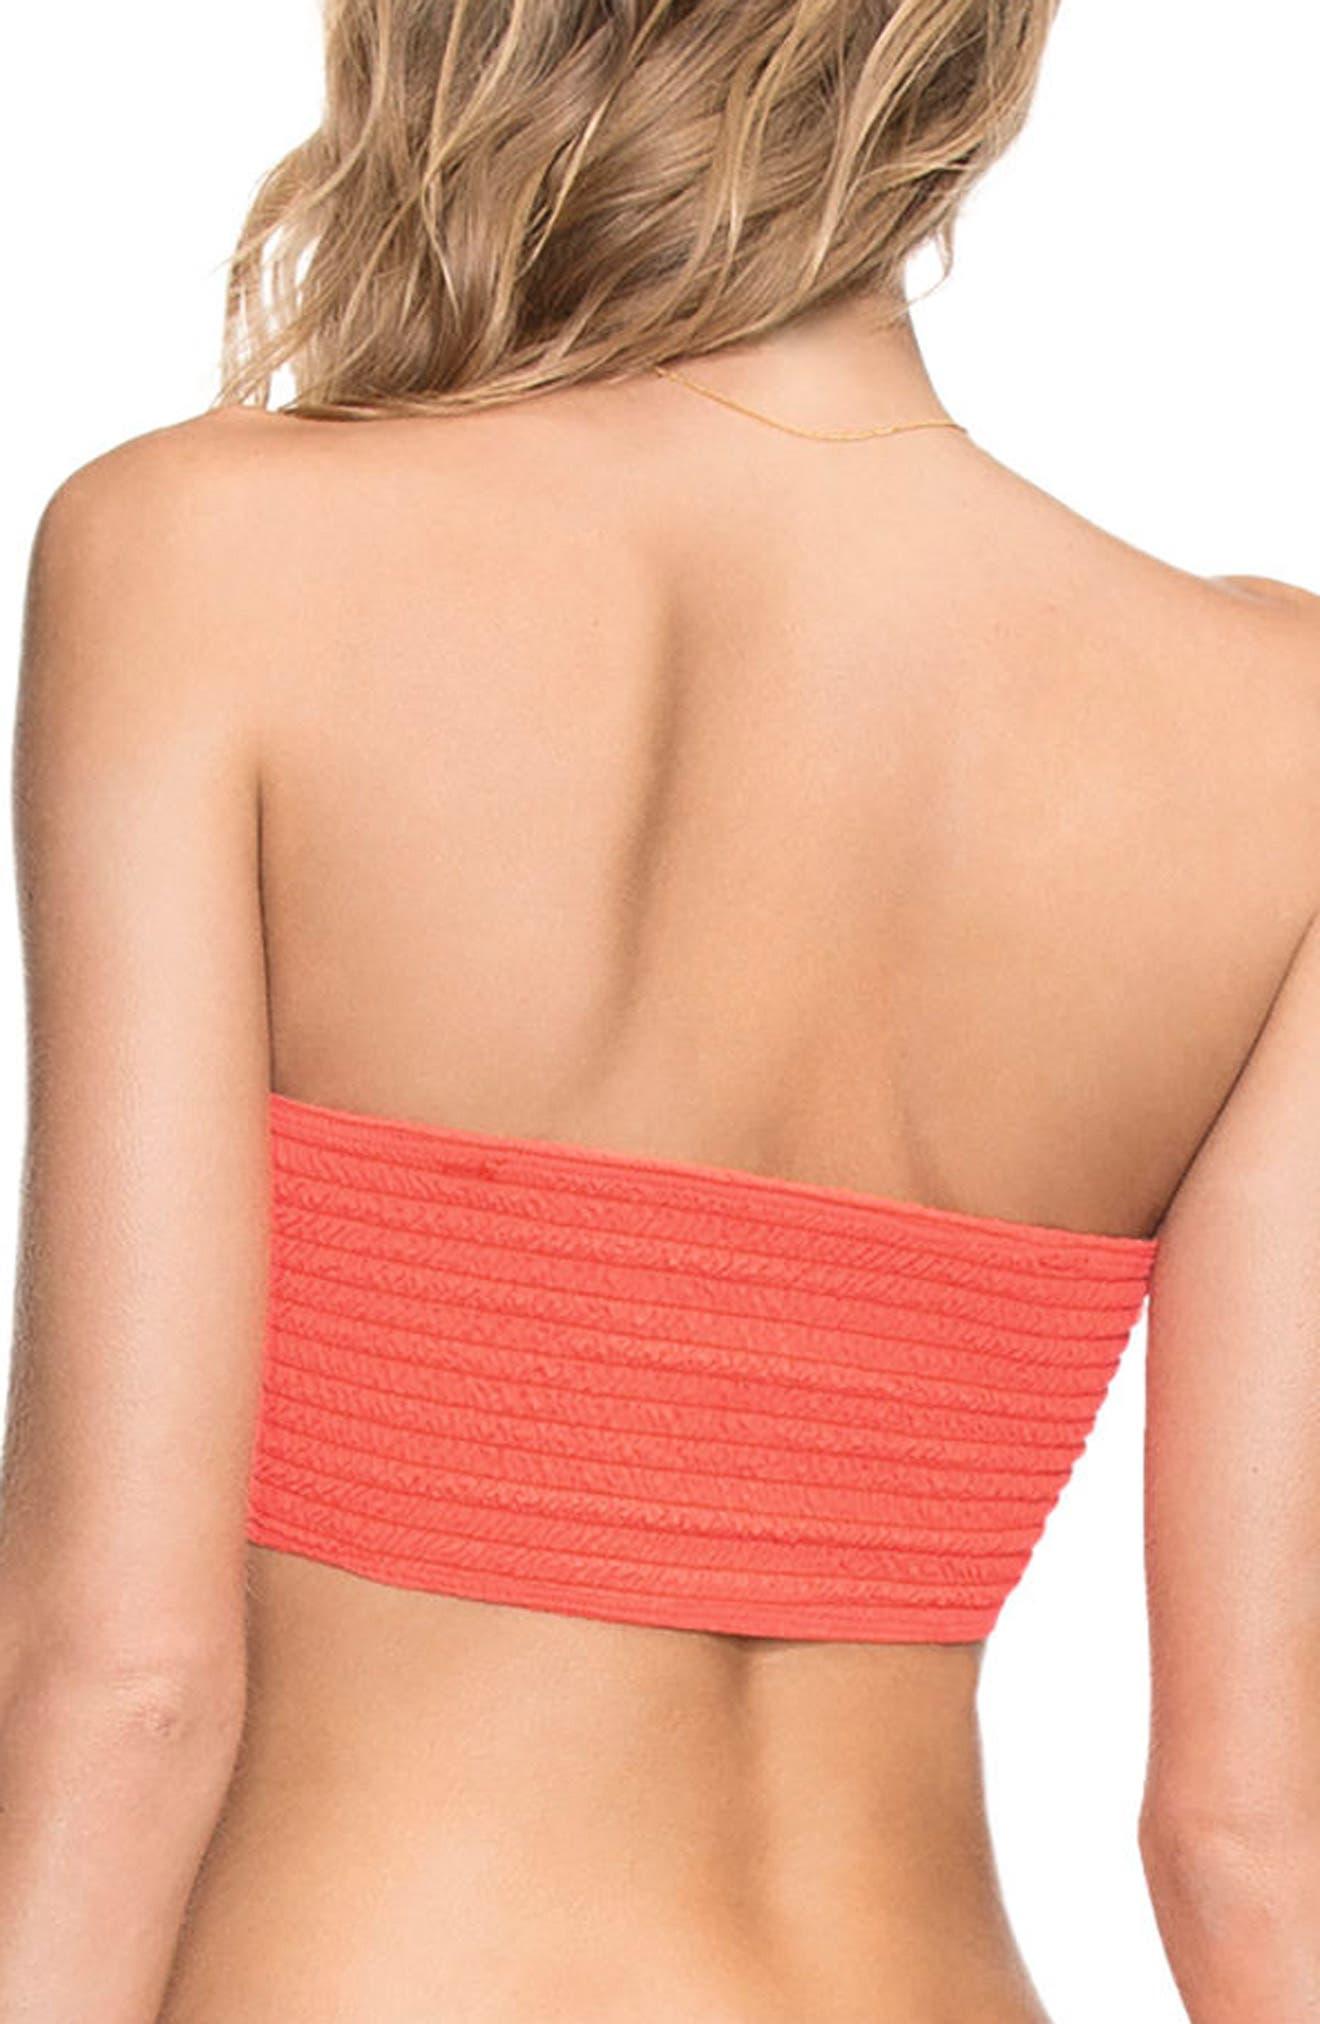 Dahlia Four-Way Reversible Bandeau Bikini Top,                             Alternate thumbnail 2, color,                             600